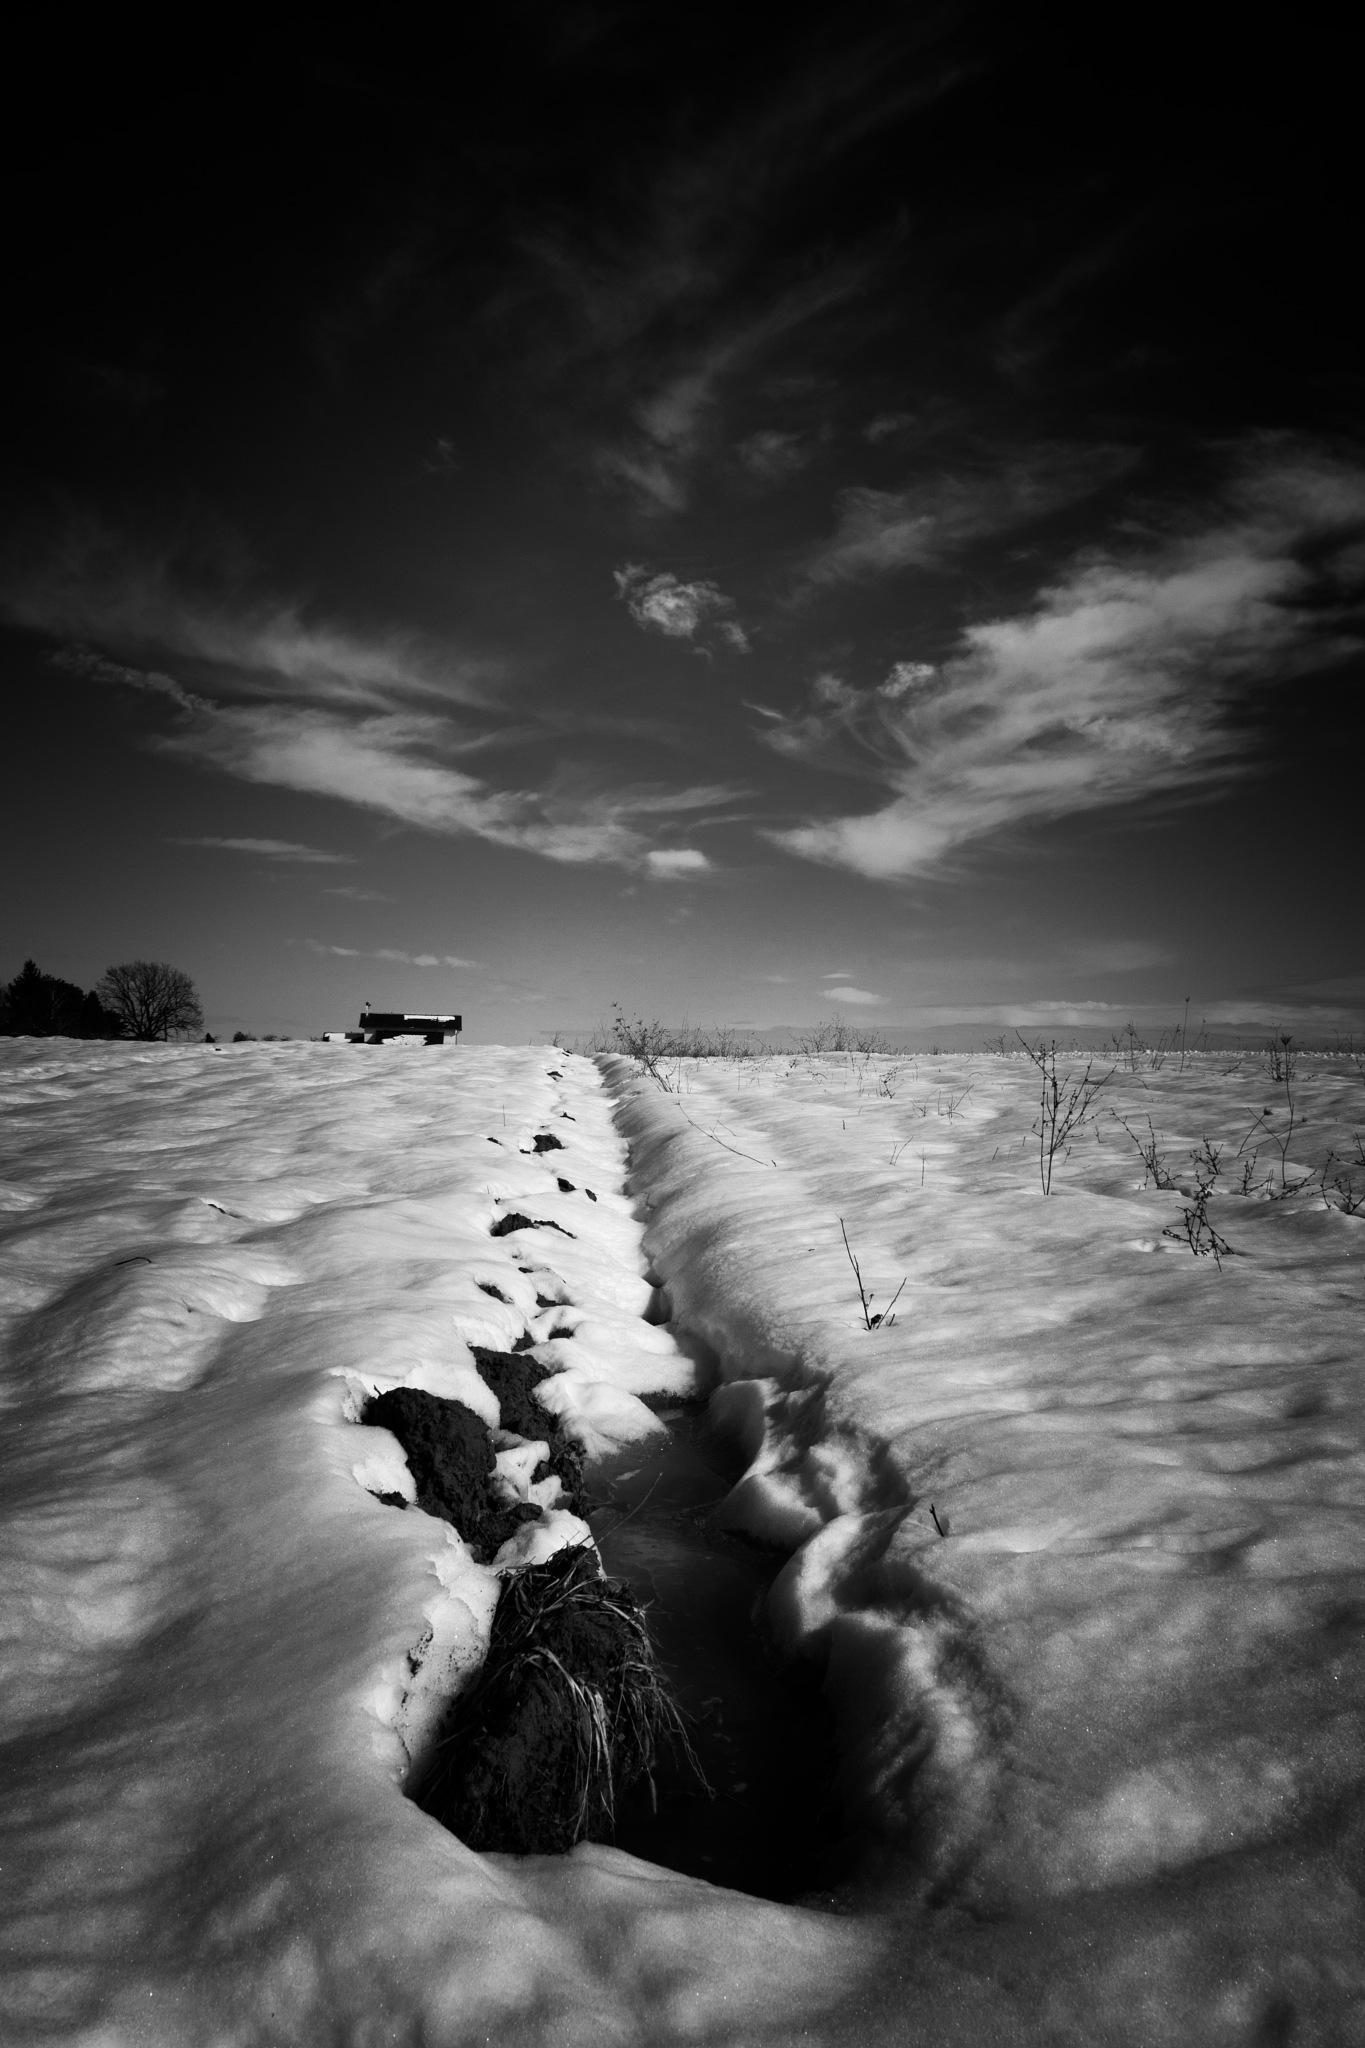 Strange Days by Kruno Kuprešak